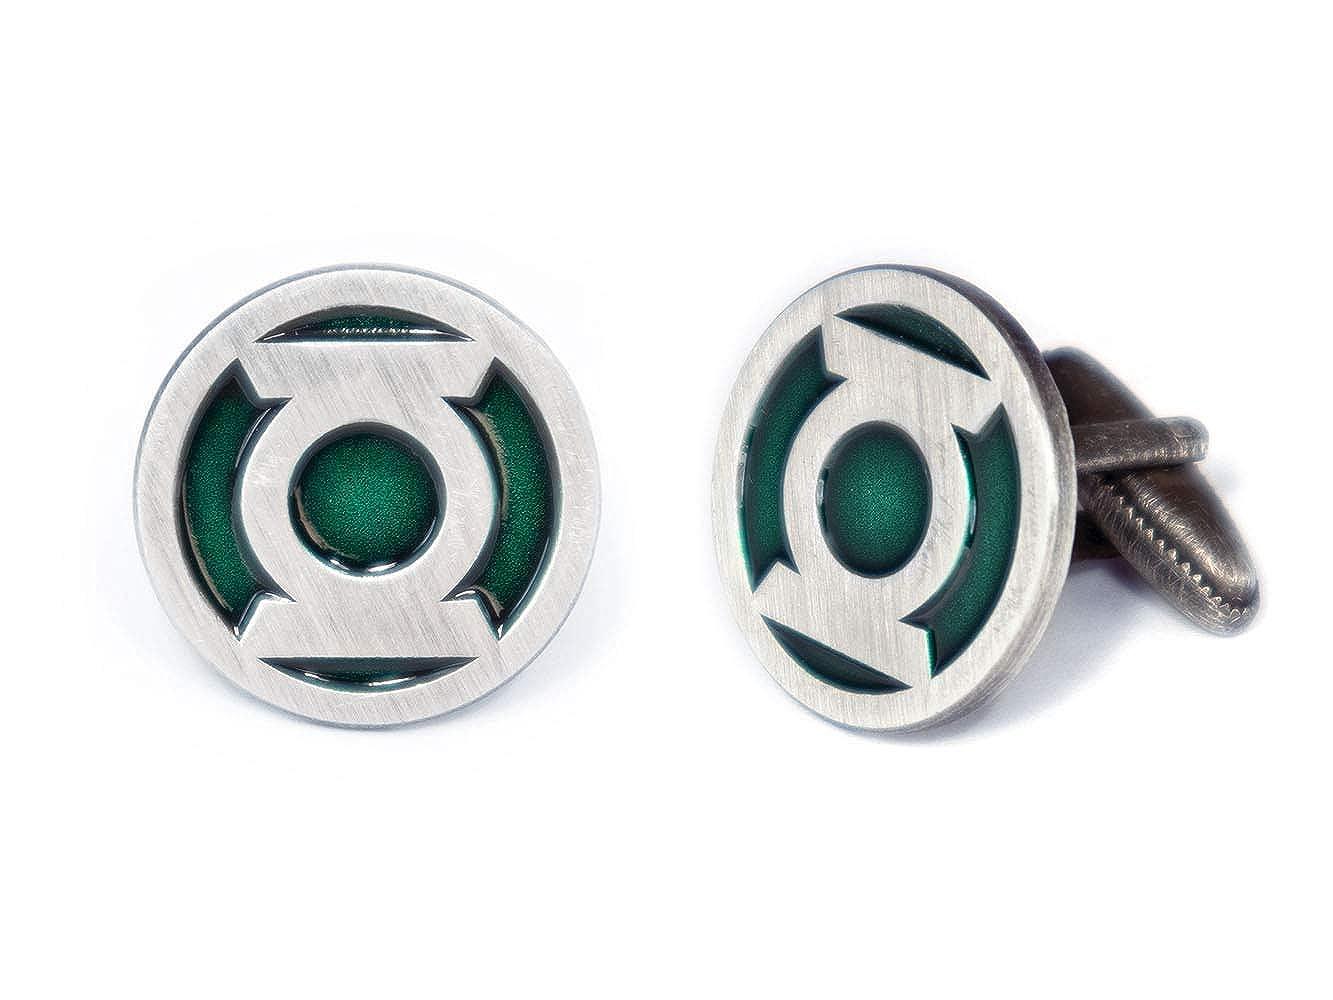 Justice League Tie Clip Green Lantern Logo Cuff Links Link Wedding Party Gift SharedImagination Green Lantern Cufflinks Batman vs Superman Tie Tack Jewelry Avengers Groomsmen Gifts